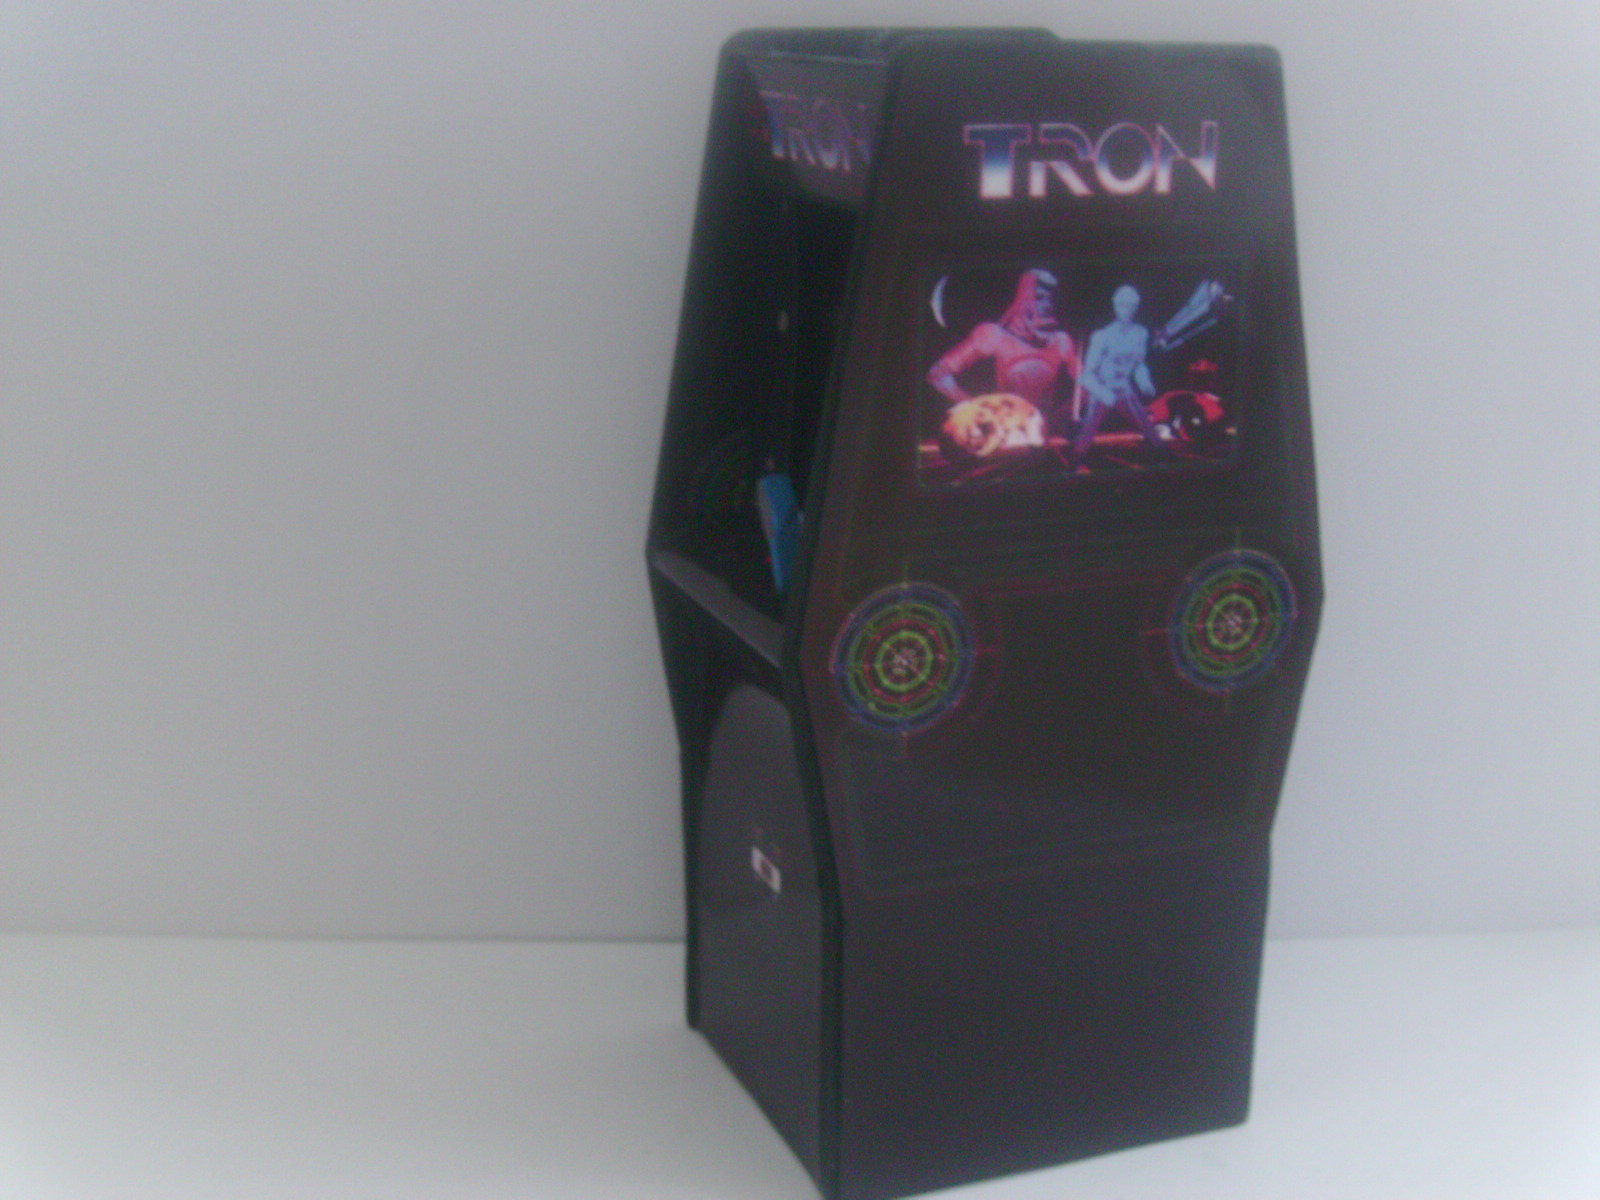 Retro Heart Tron Custom Scale Arcade Model